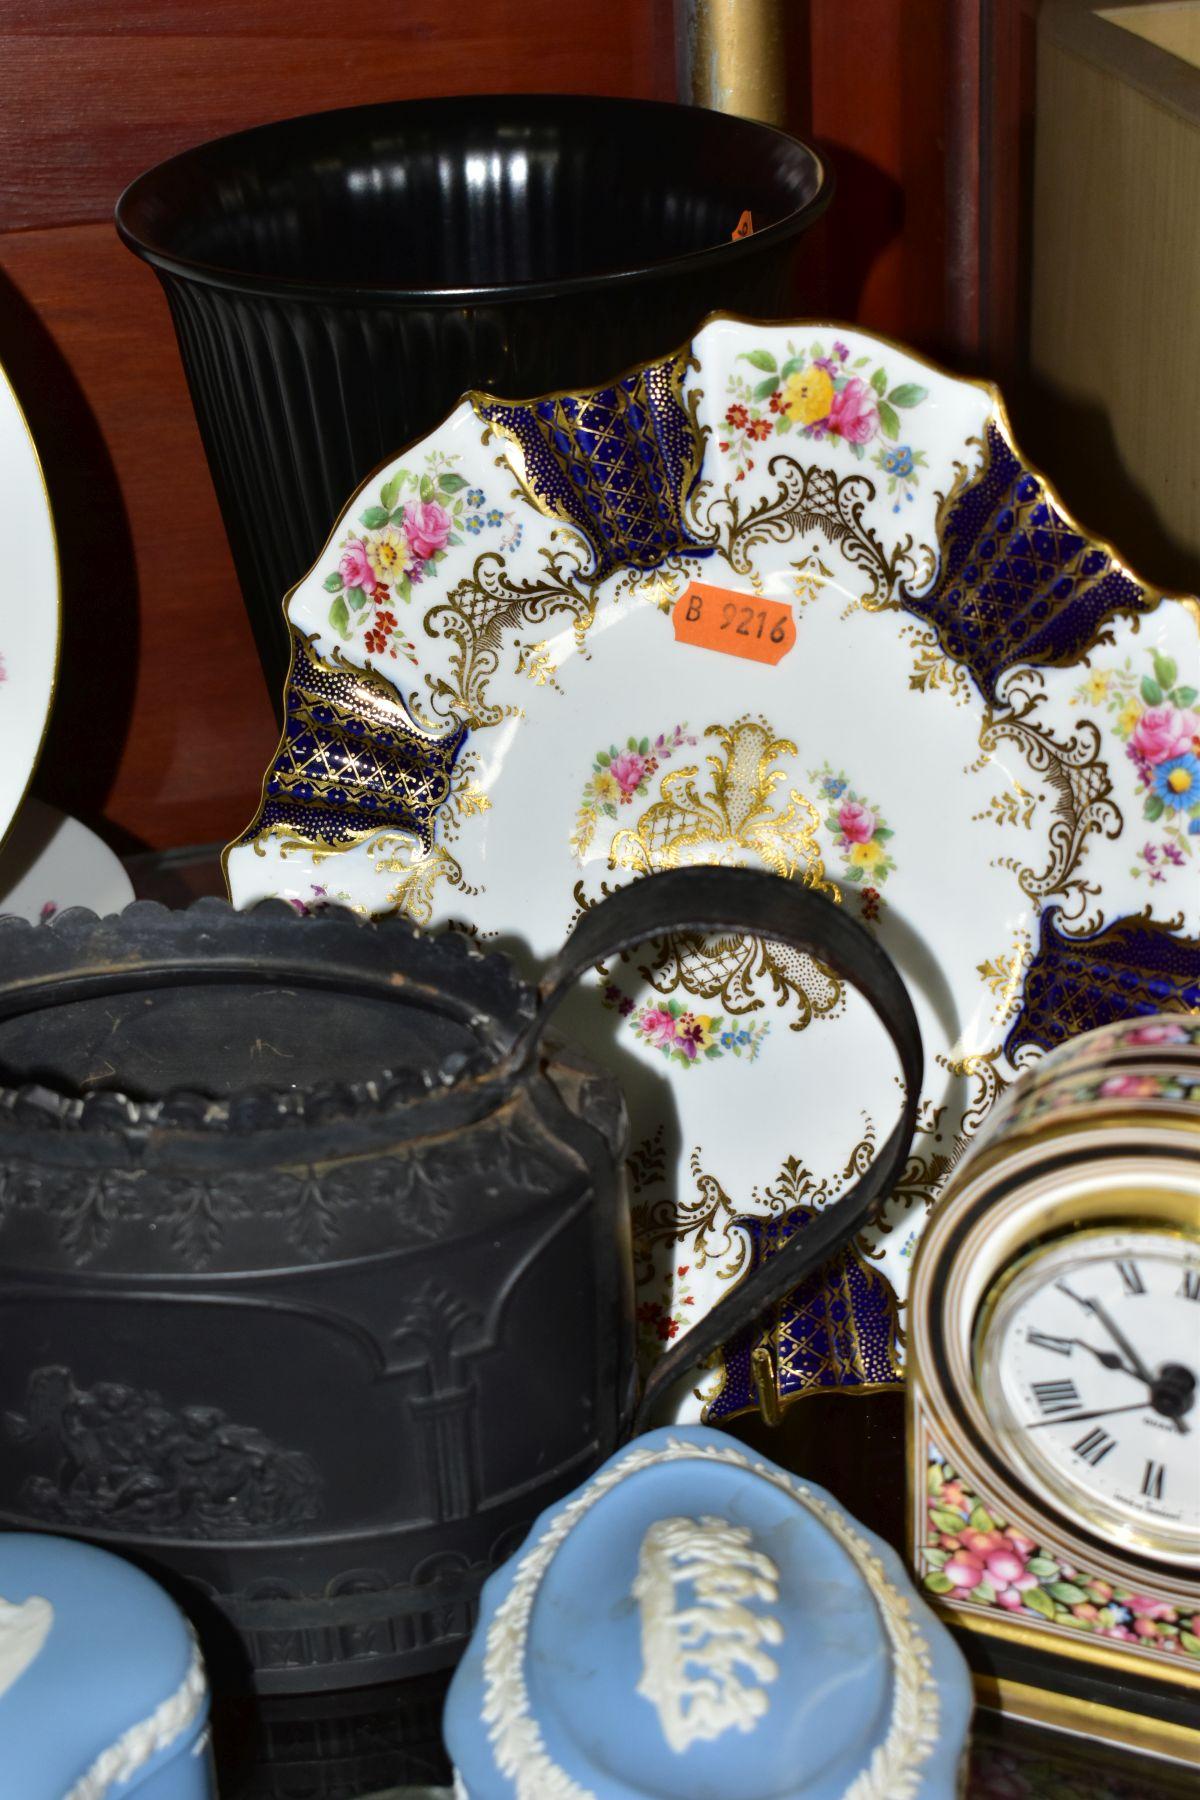 CERAMICS to include blue jasper ware trinkets, etc, Wedgwood Clio clock, black basalt teapot with - Image 6 of 8